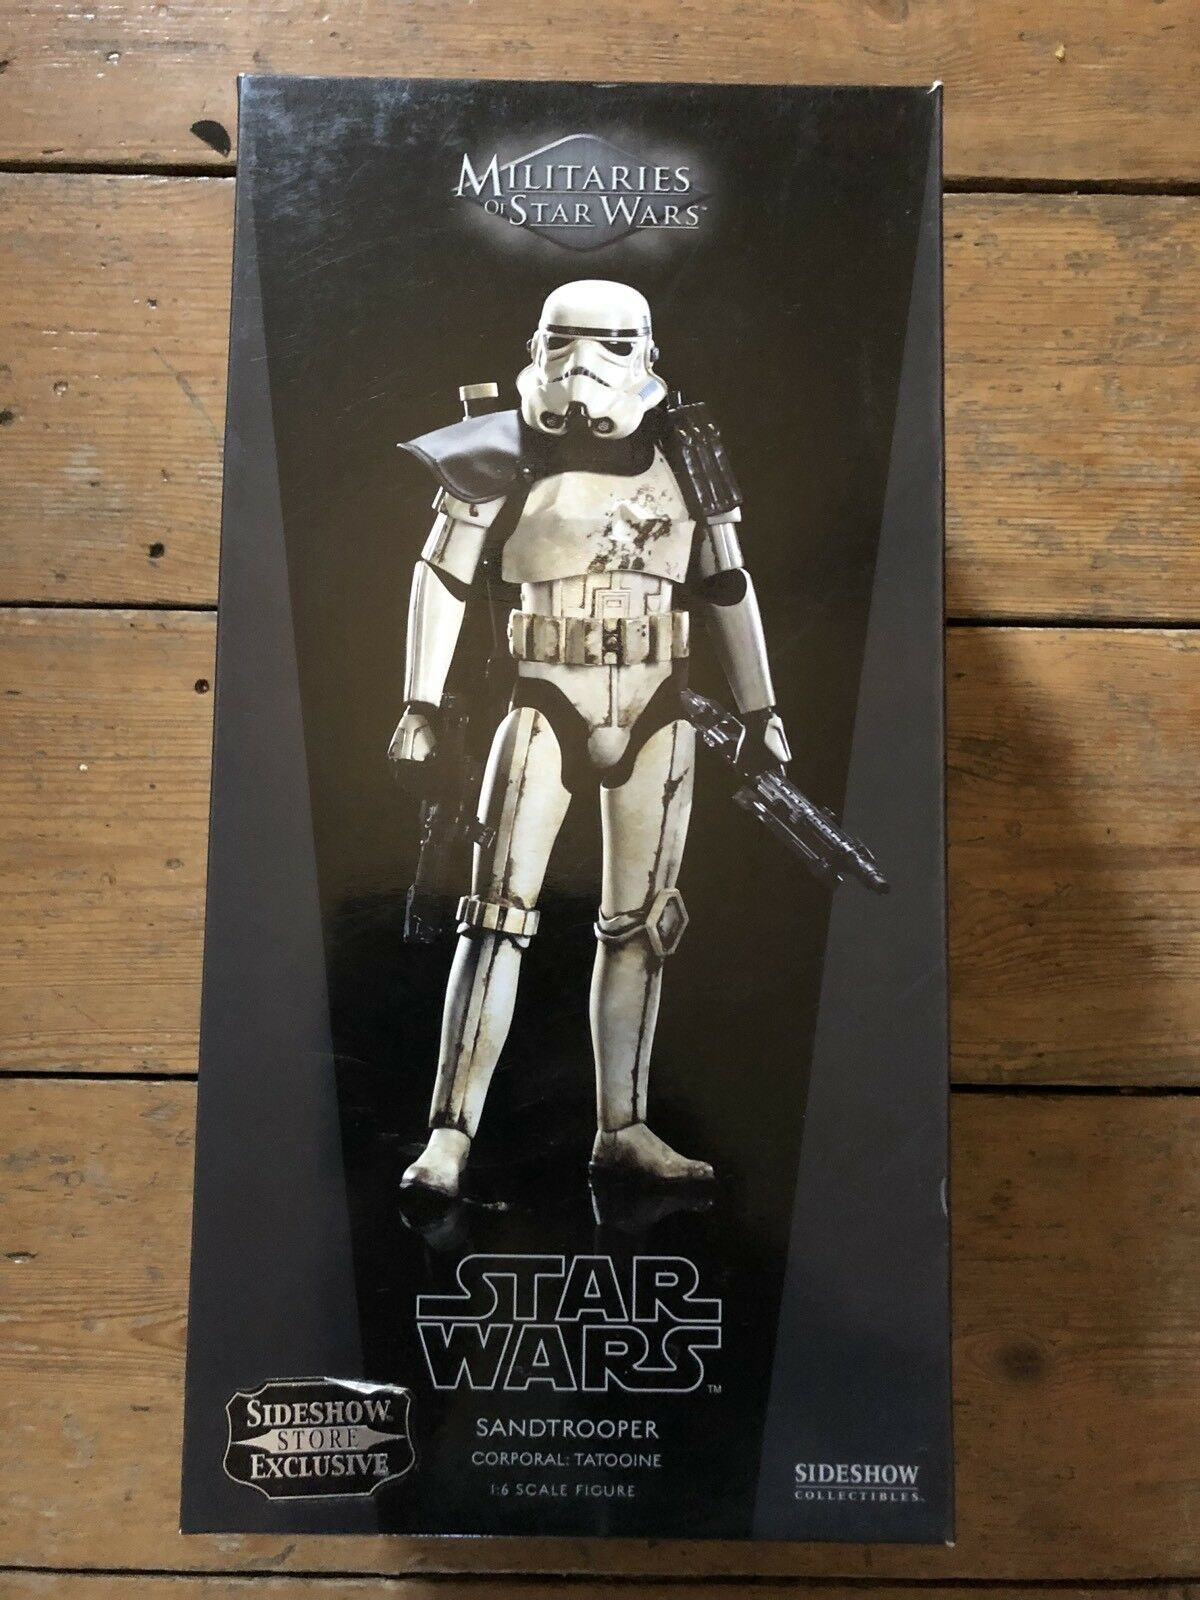 Sideshow ejércitos de Star Wars Sandtrooper Exclusivo corporal: Tatooin afssc 241